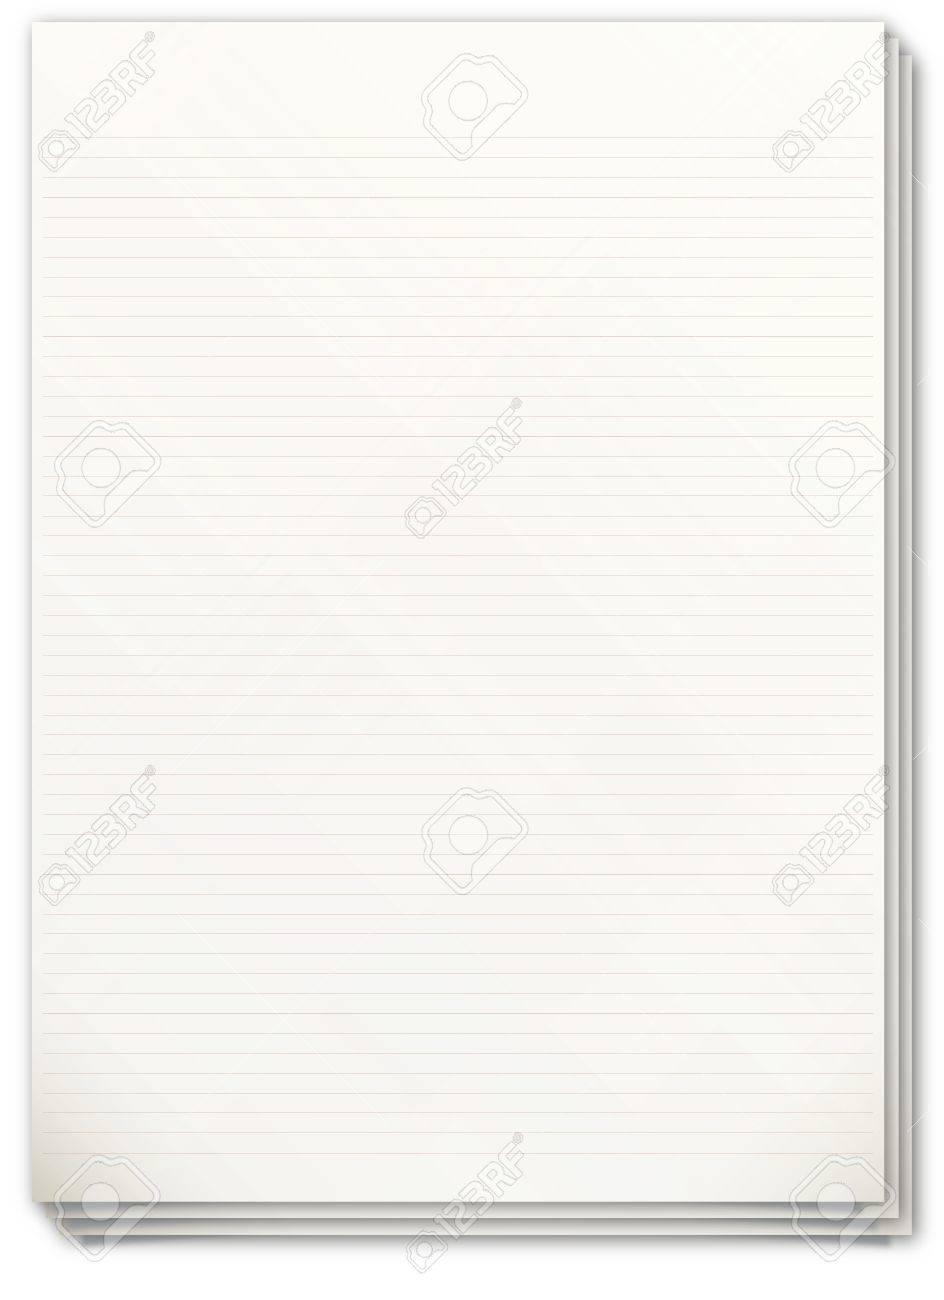 Sfondo bianco da foto